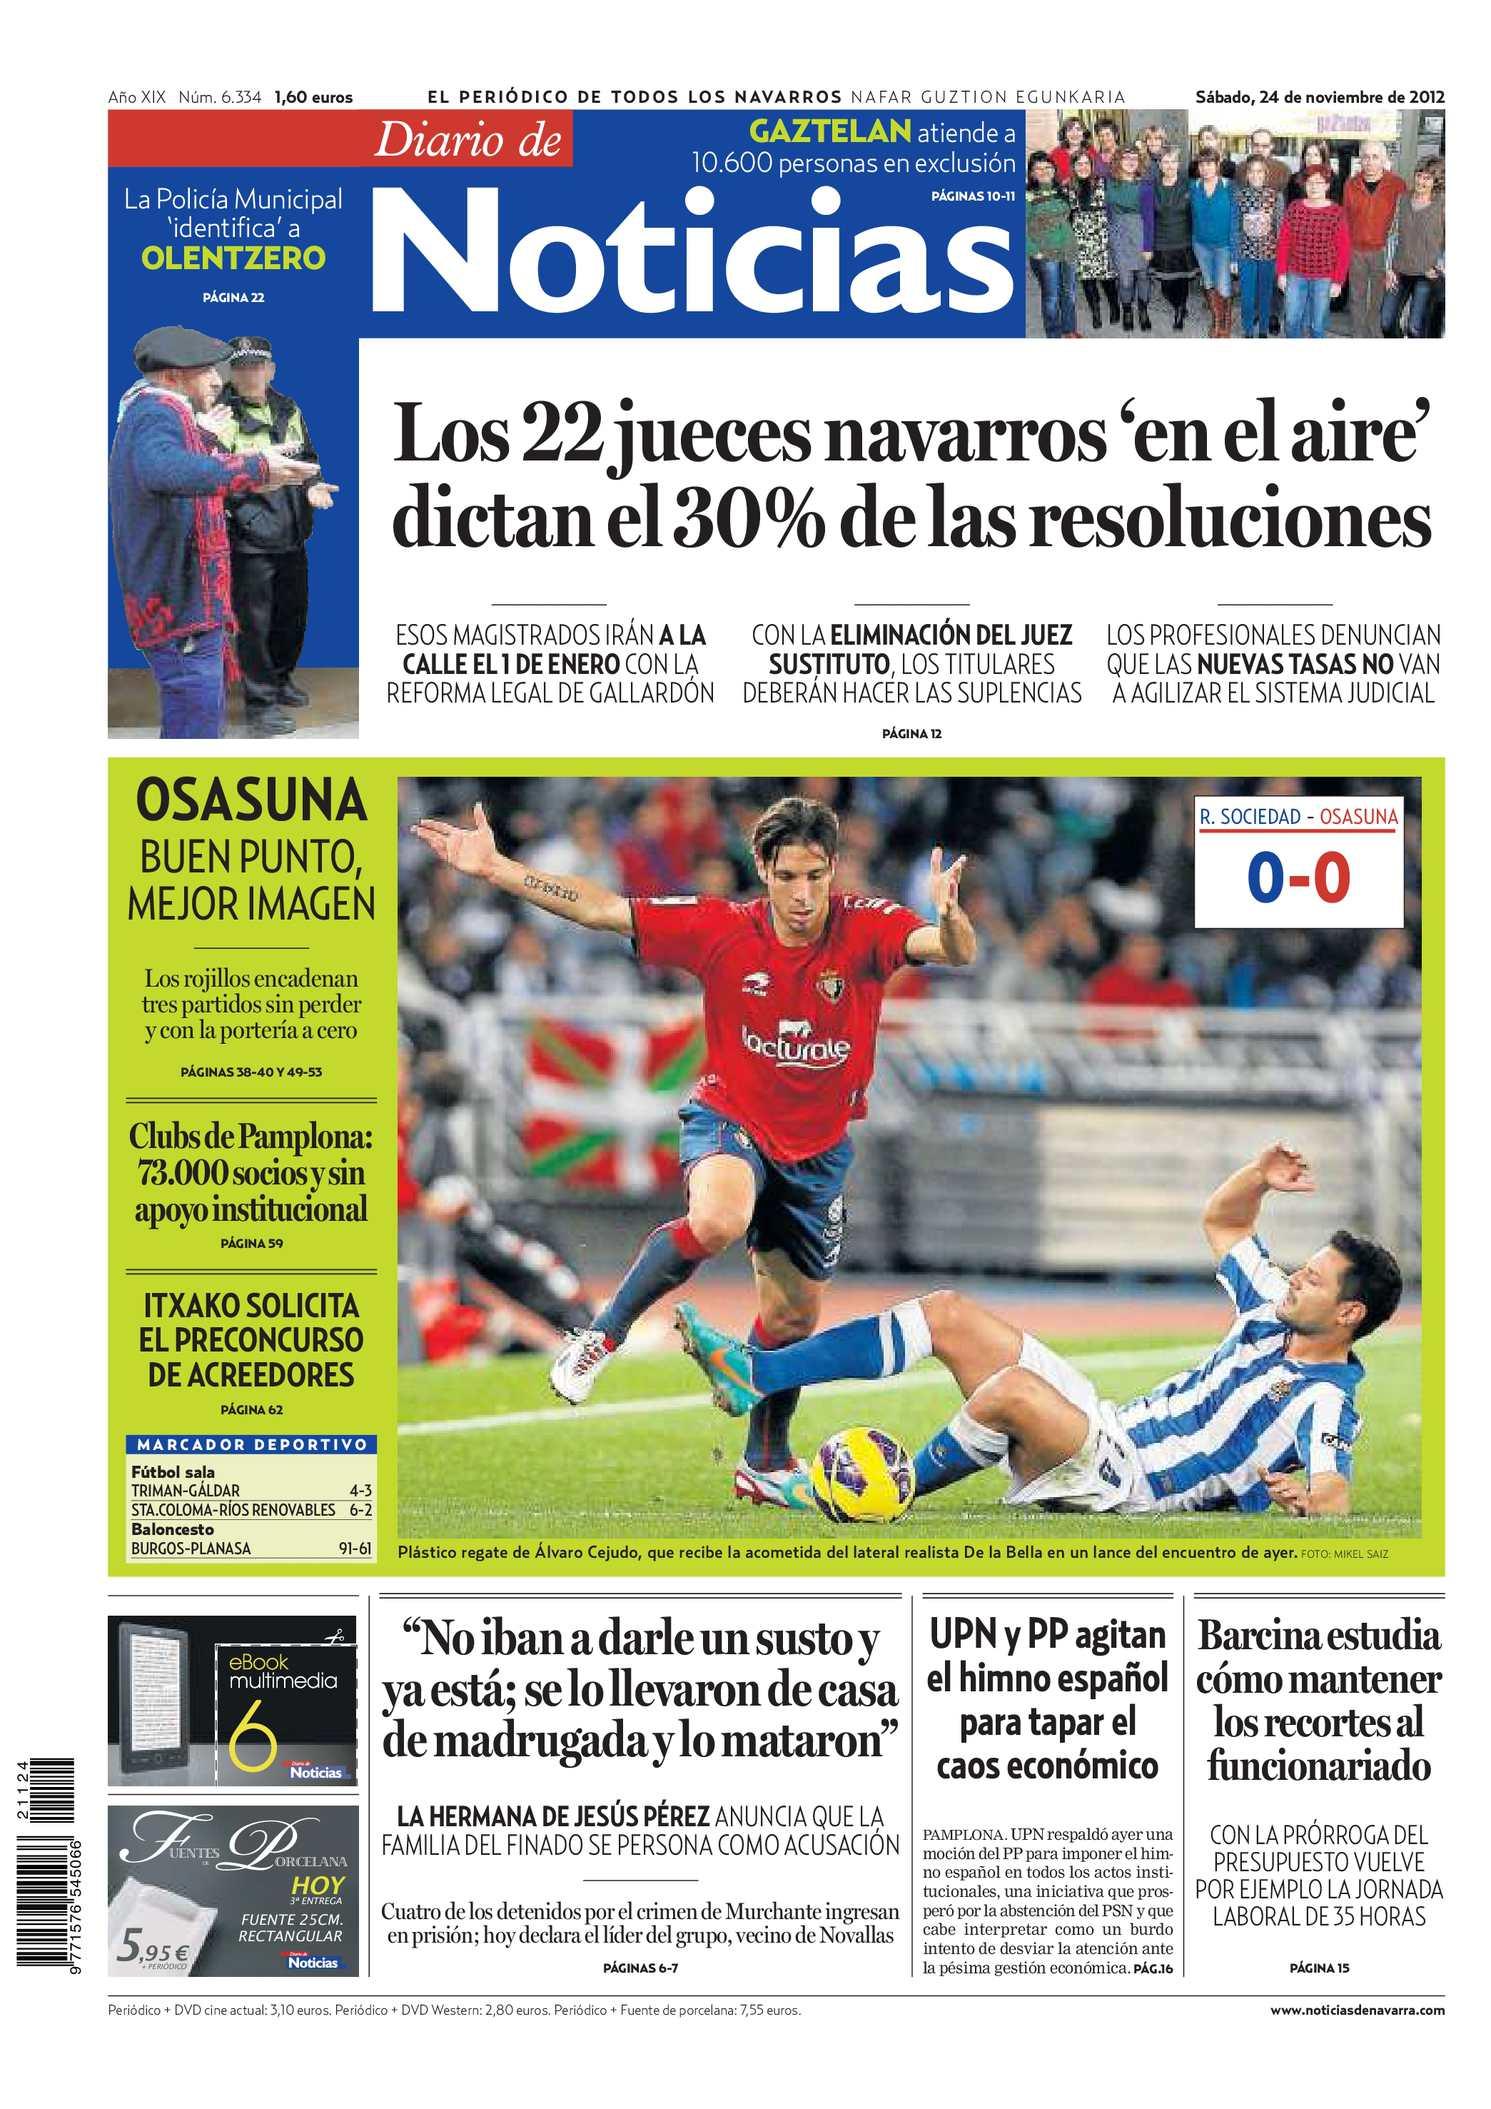 Calaméo - Diario de Noticias 20121124 6c84afd8509